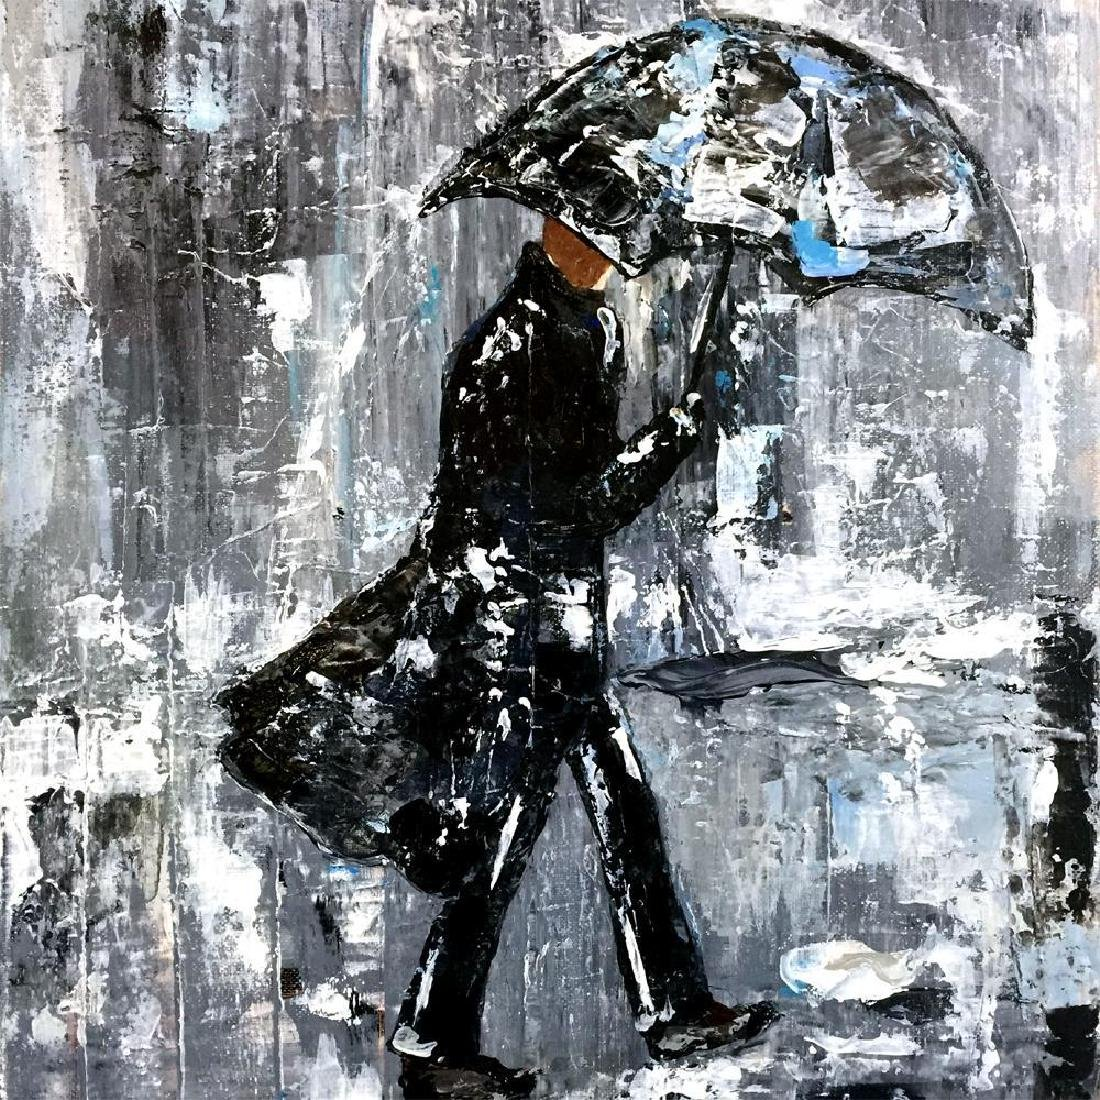 Swahn Man with Umbrella City Scene Textured - 3